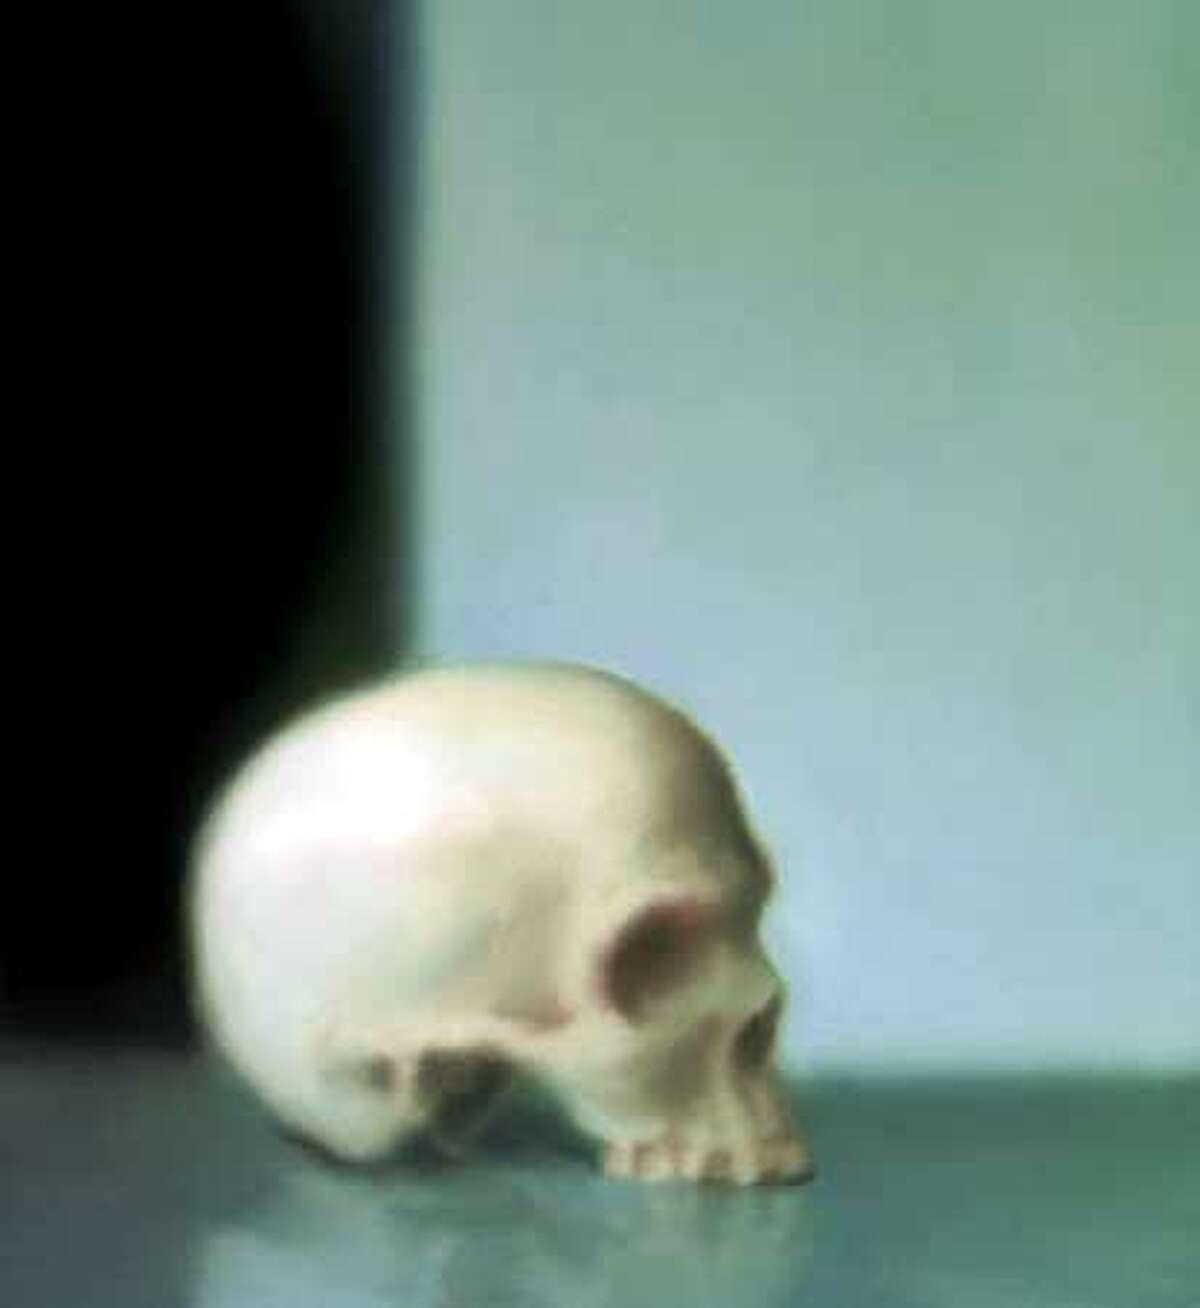 Richter Gerhard Skull Oil on canvas (HANDOUT PHOTO)